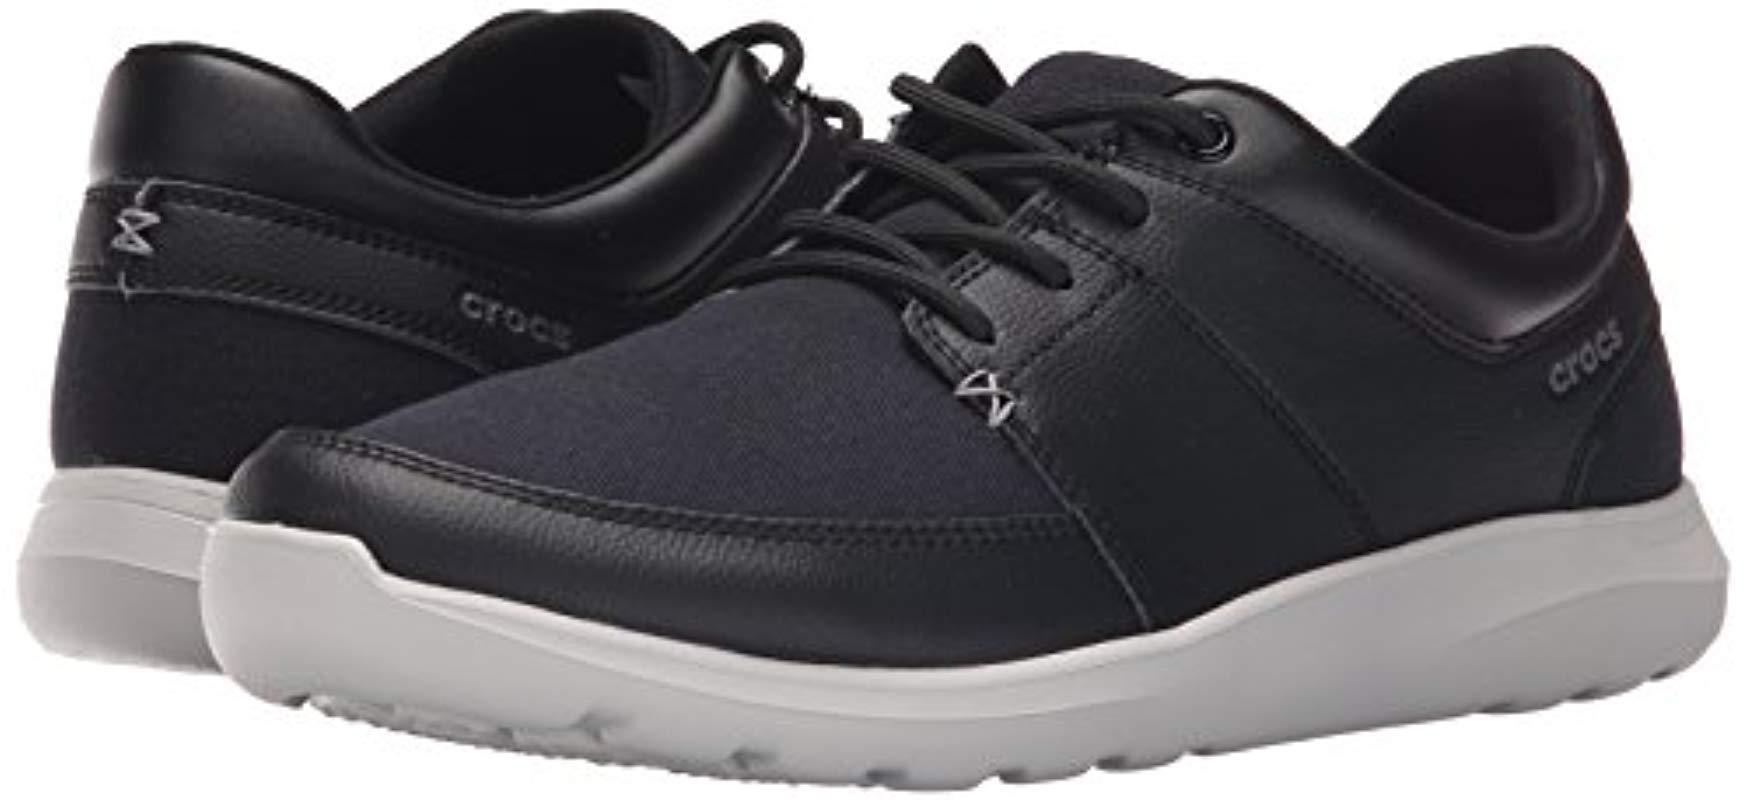 Crocs™ 203052 Boating Shoes in Black